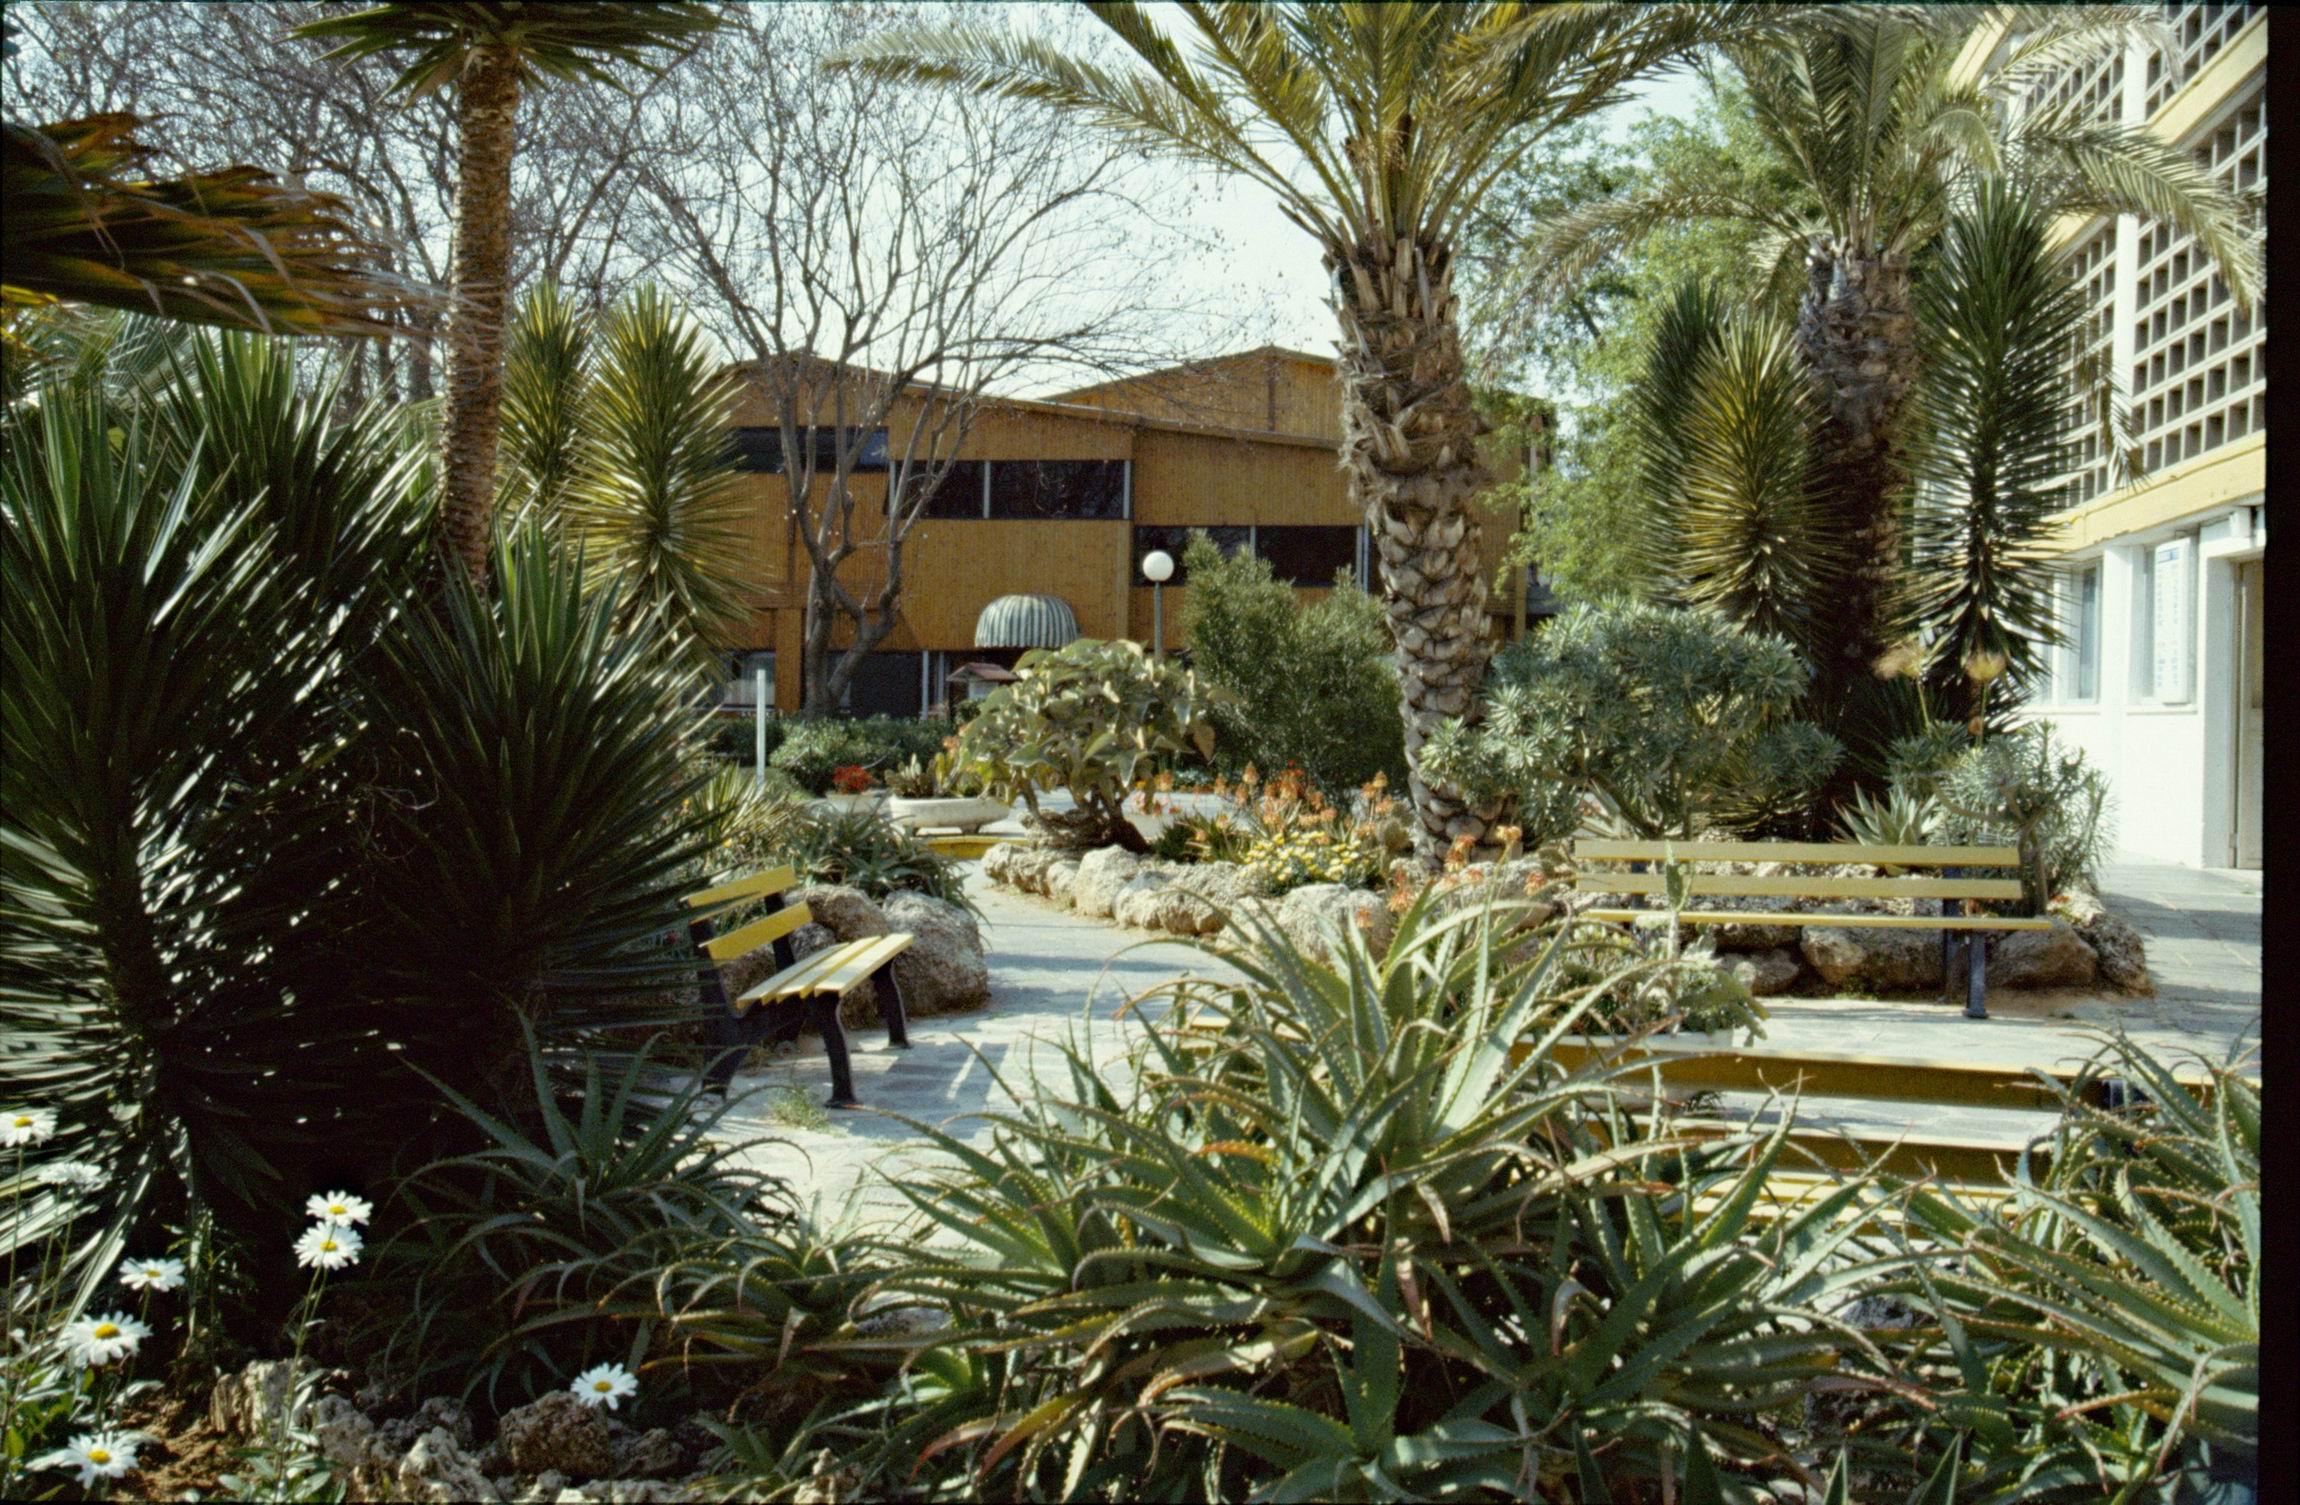 1984_04 (02) Kfar Maccabiah_notre demeure